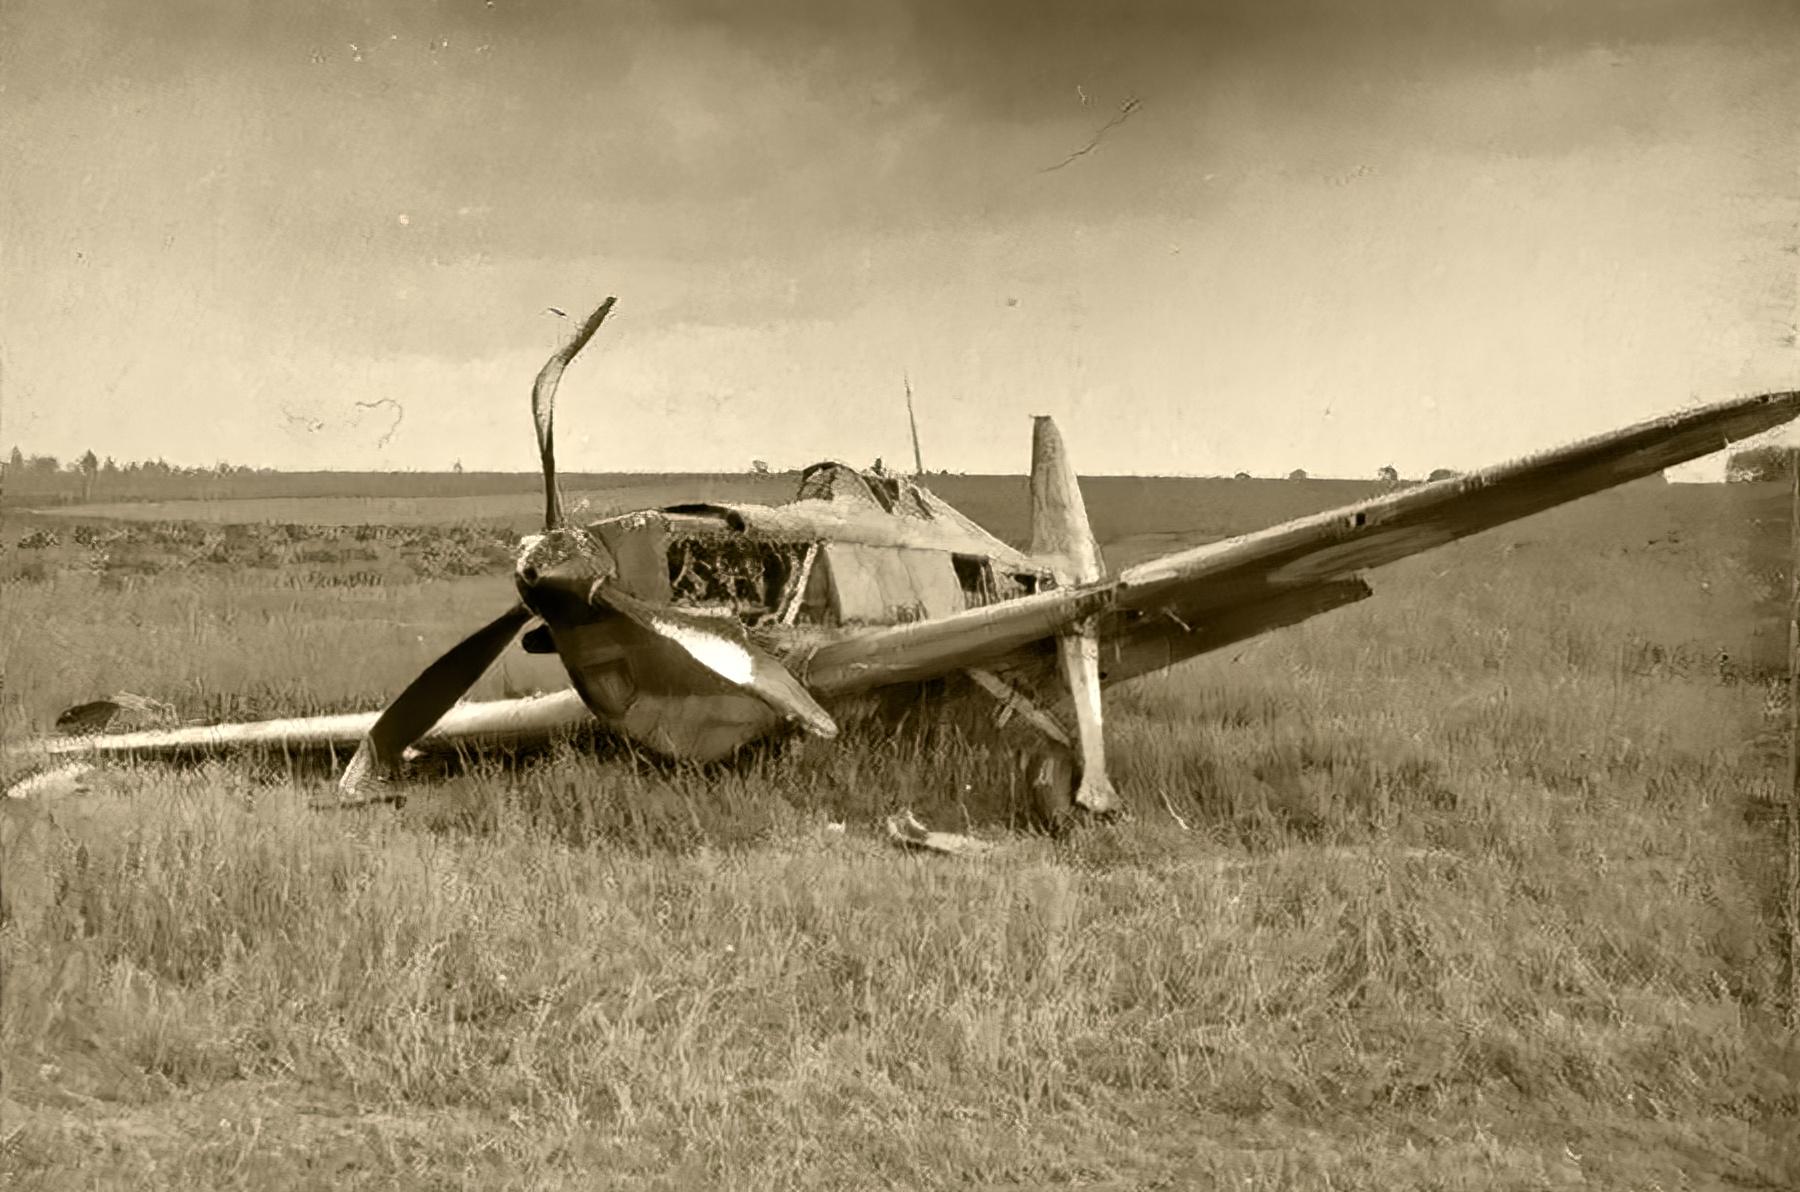 French Airforce Morane Saulnier MS 406 force landed France May Jun 1940 ebay 01